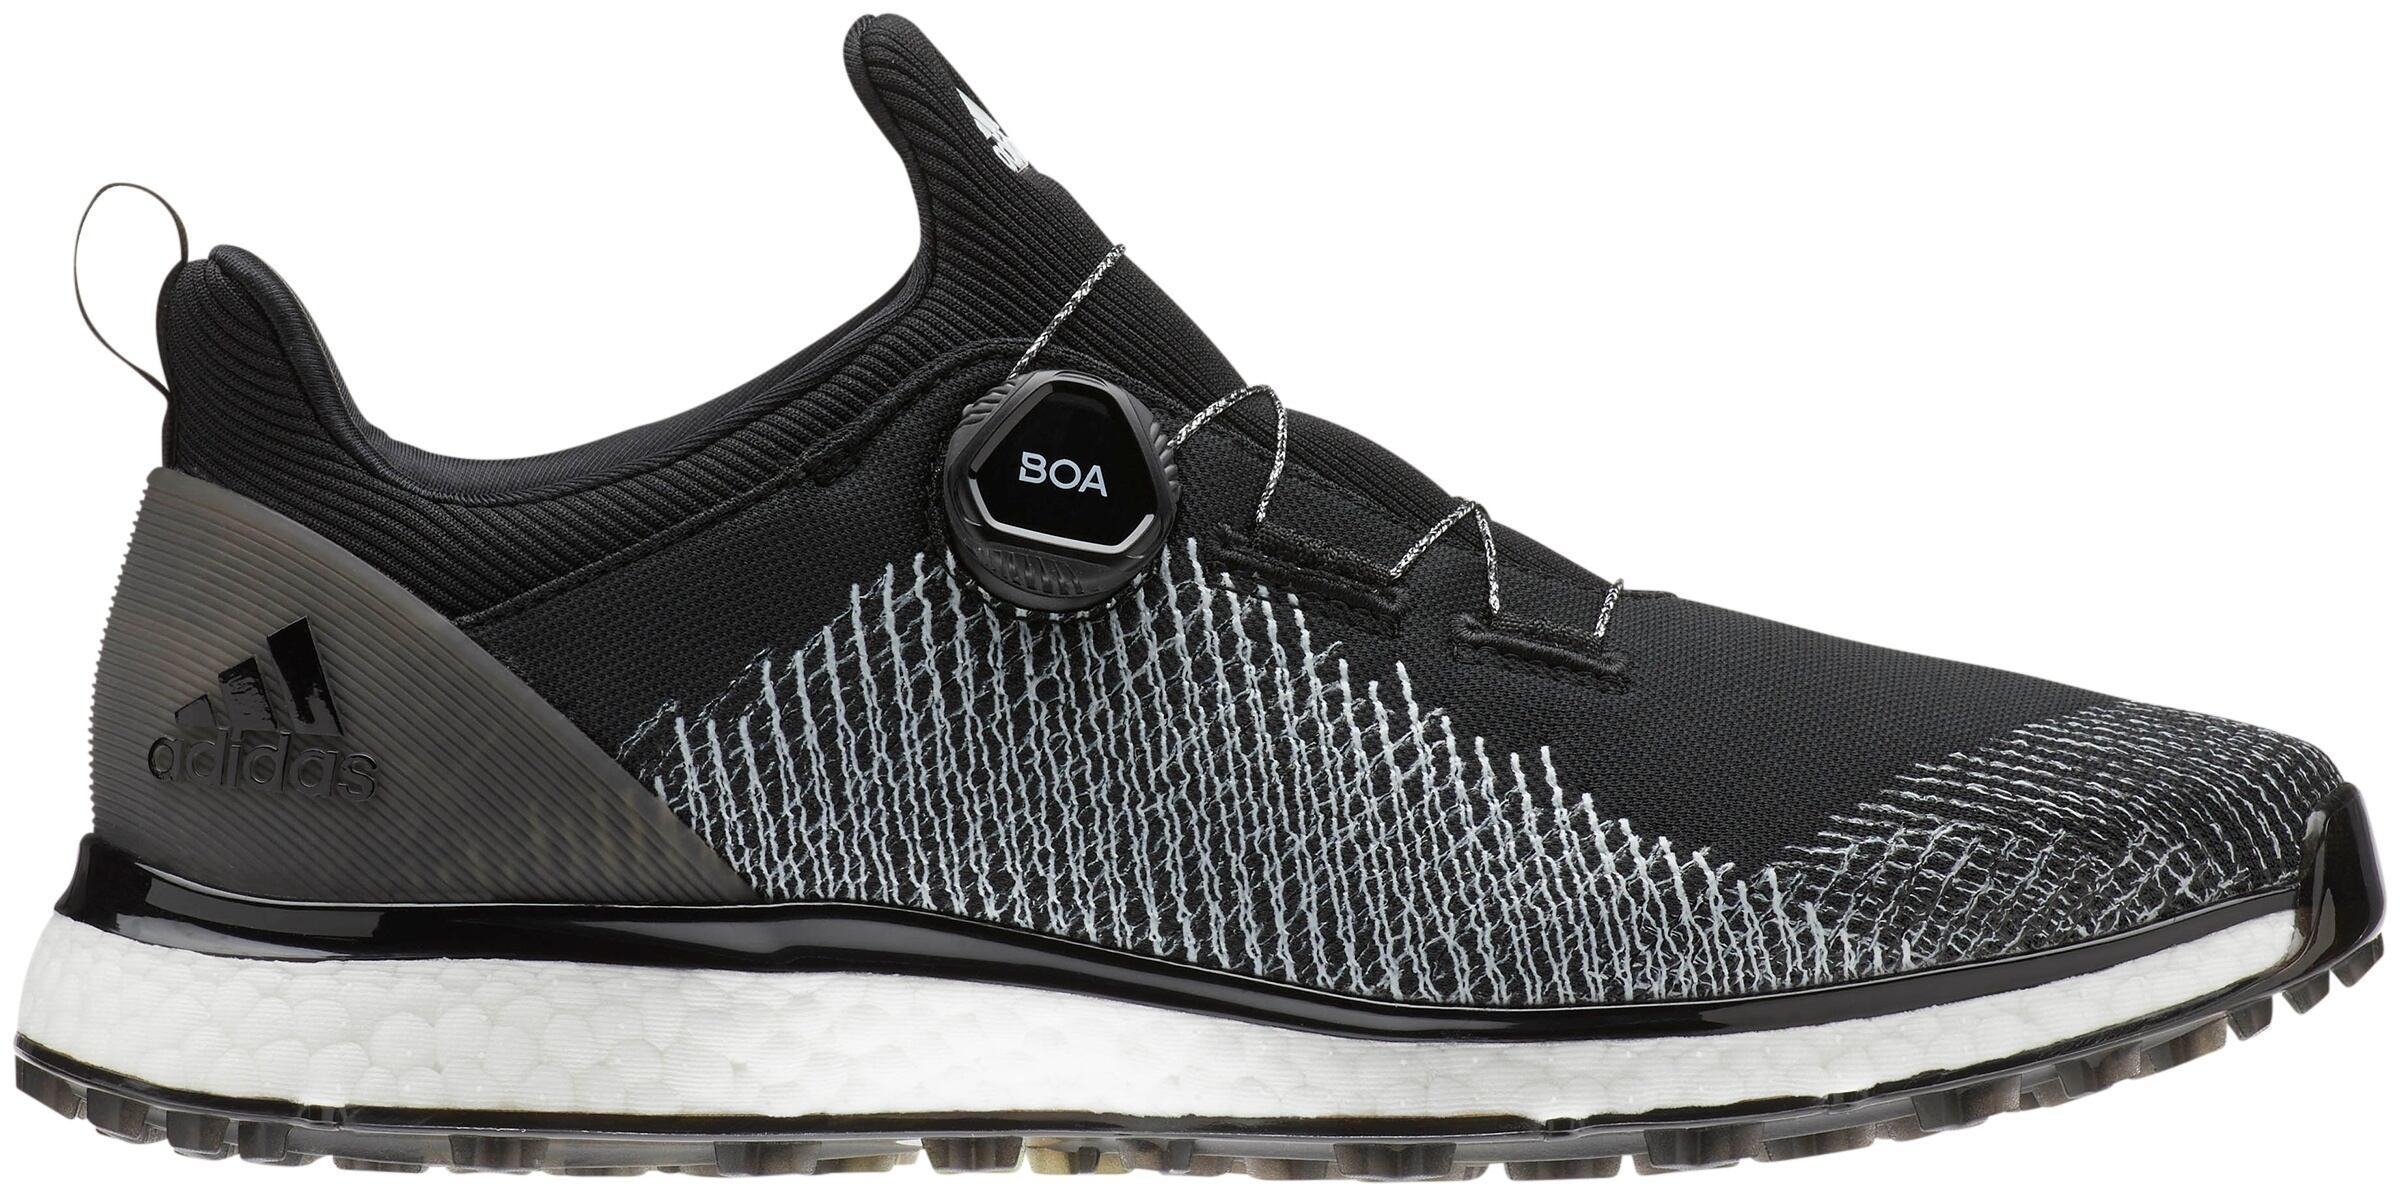 Adidas Forgefiber BOA Spikeless Shoes | RockBottomGolf.com